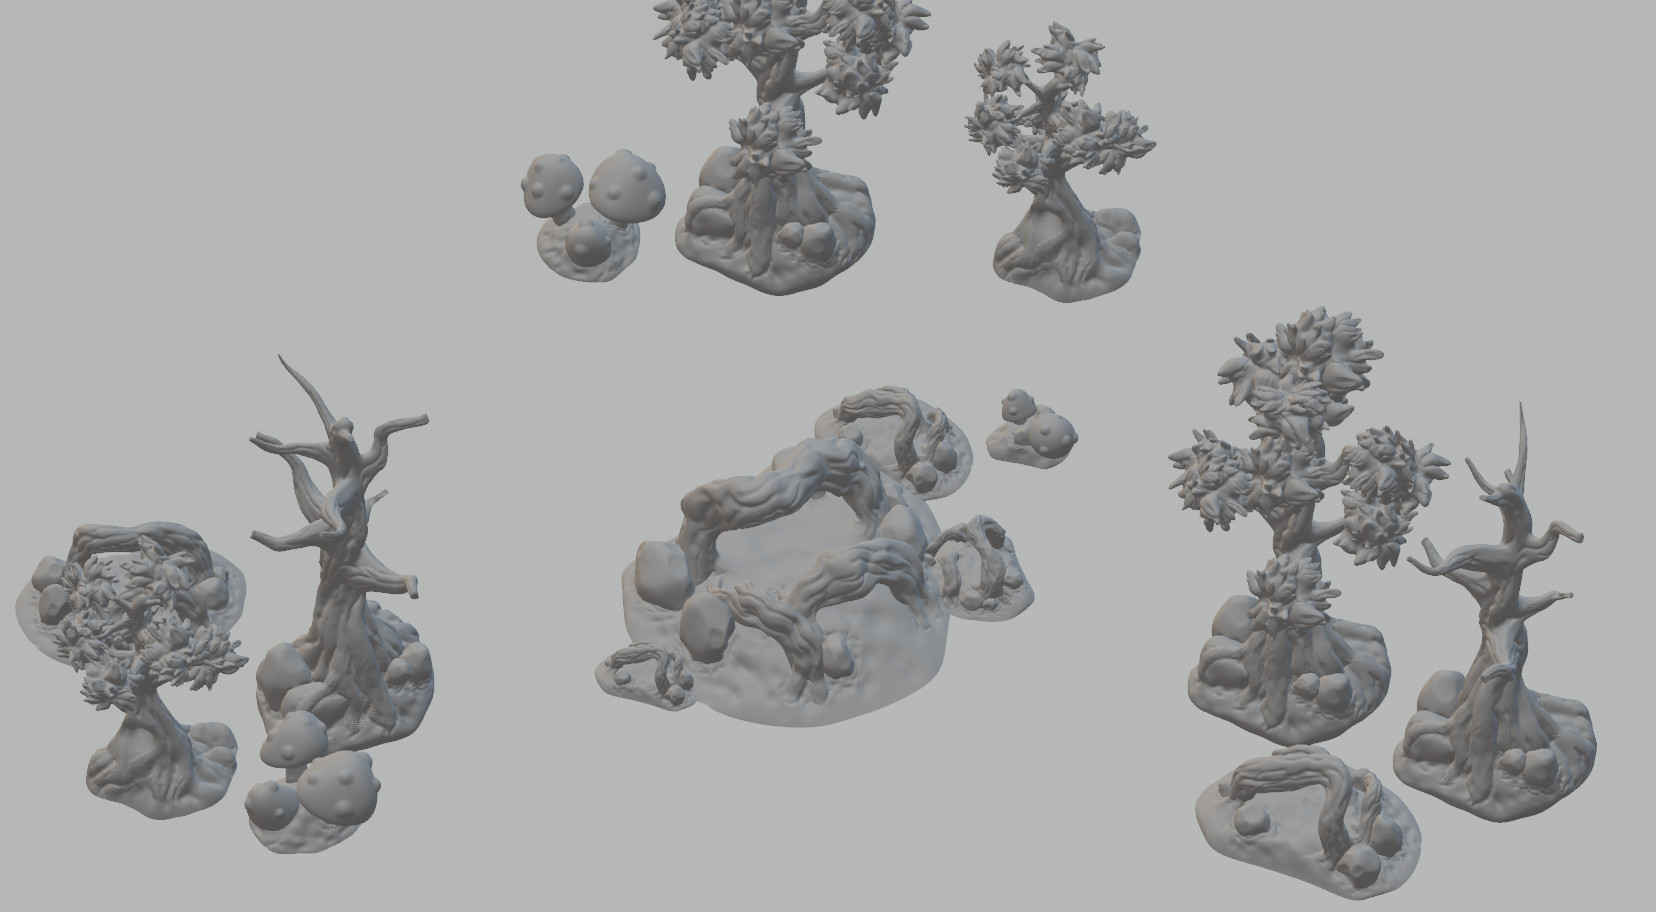 graphic regarding Printable Scenery identified as Nasos Maloudis - Character Atmosphere Printable Surroundings Established